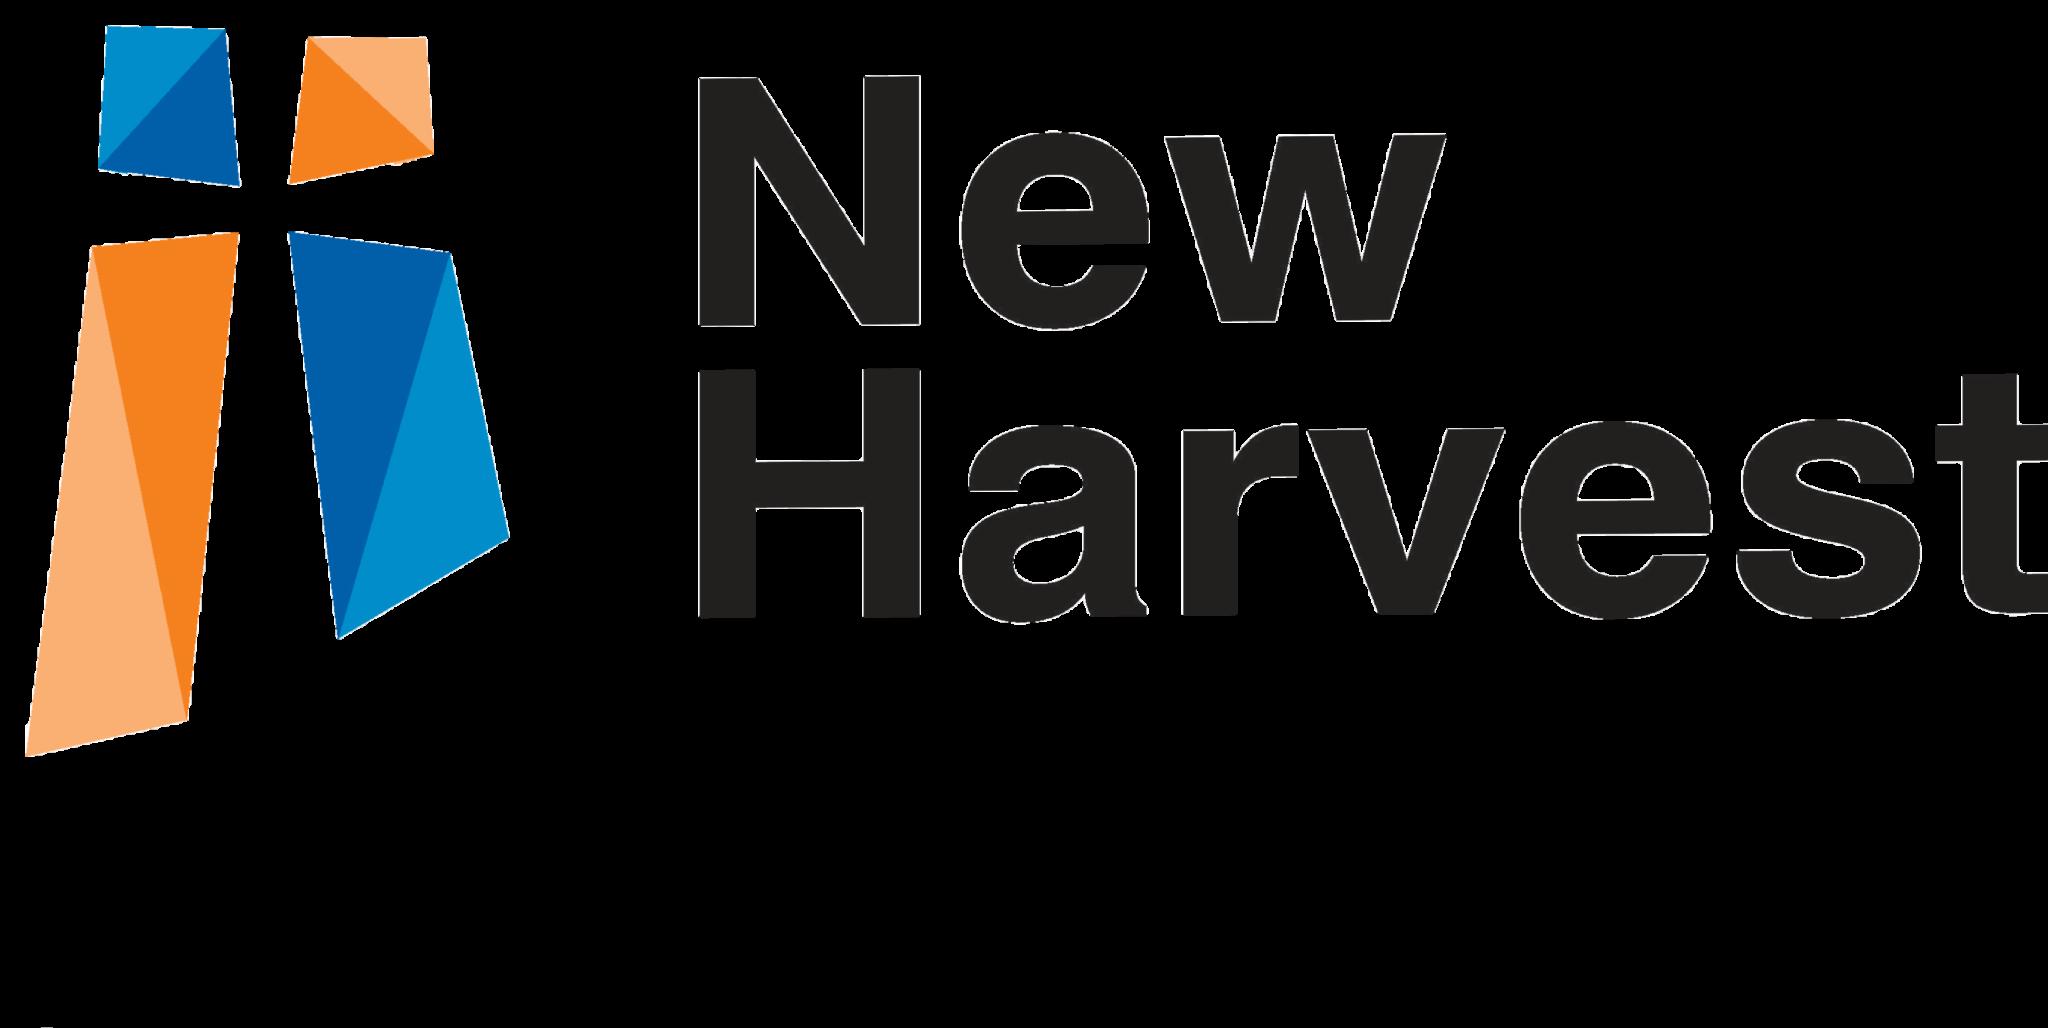 Pearland New Harvest Christian Fellowship